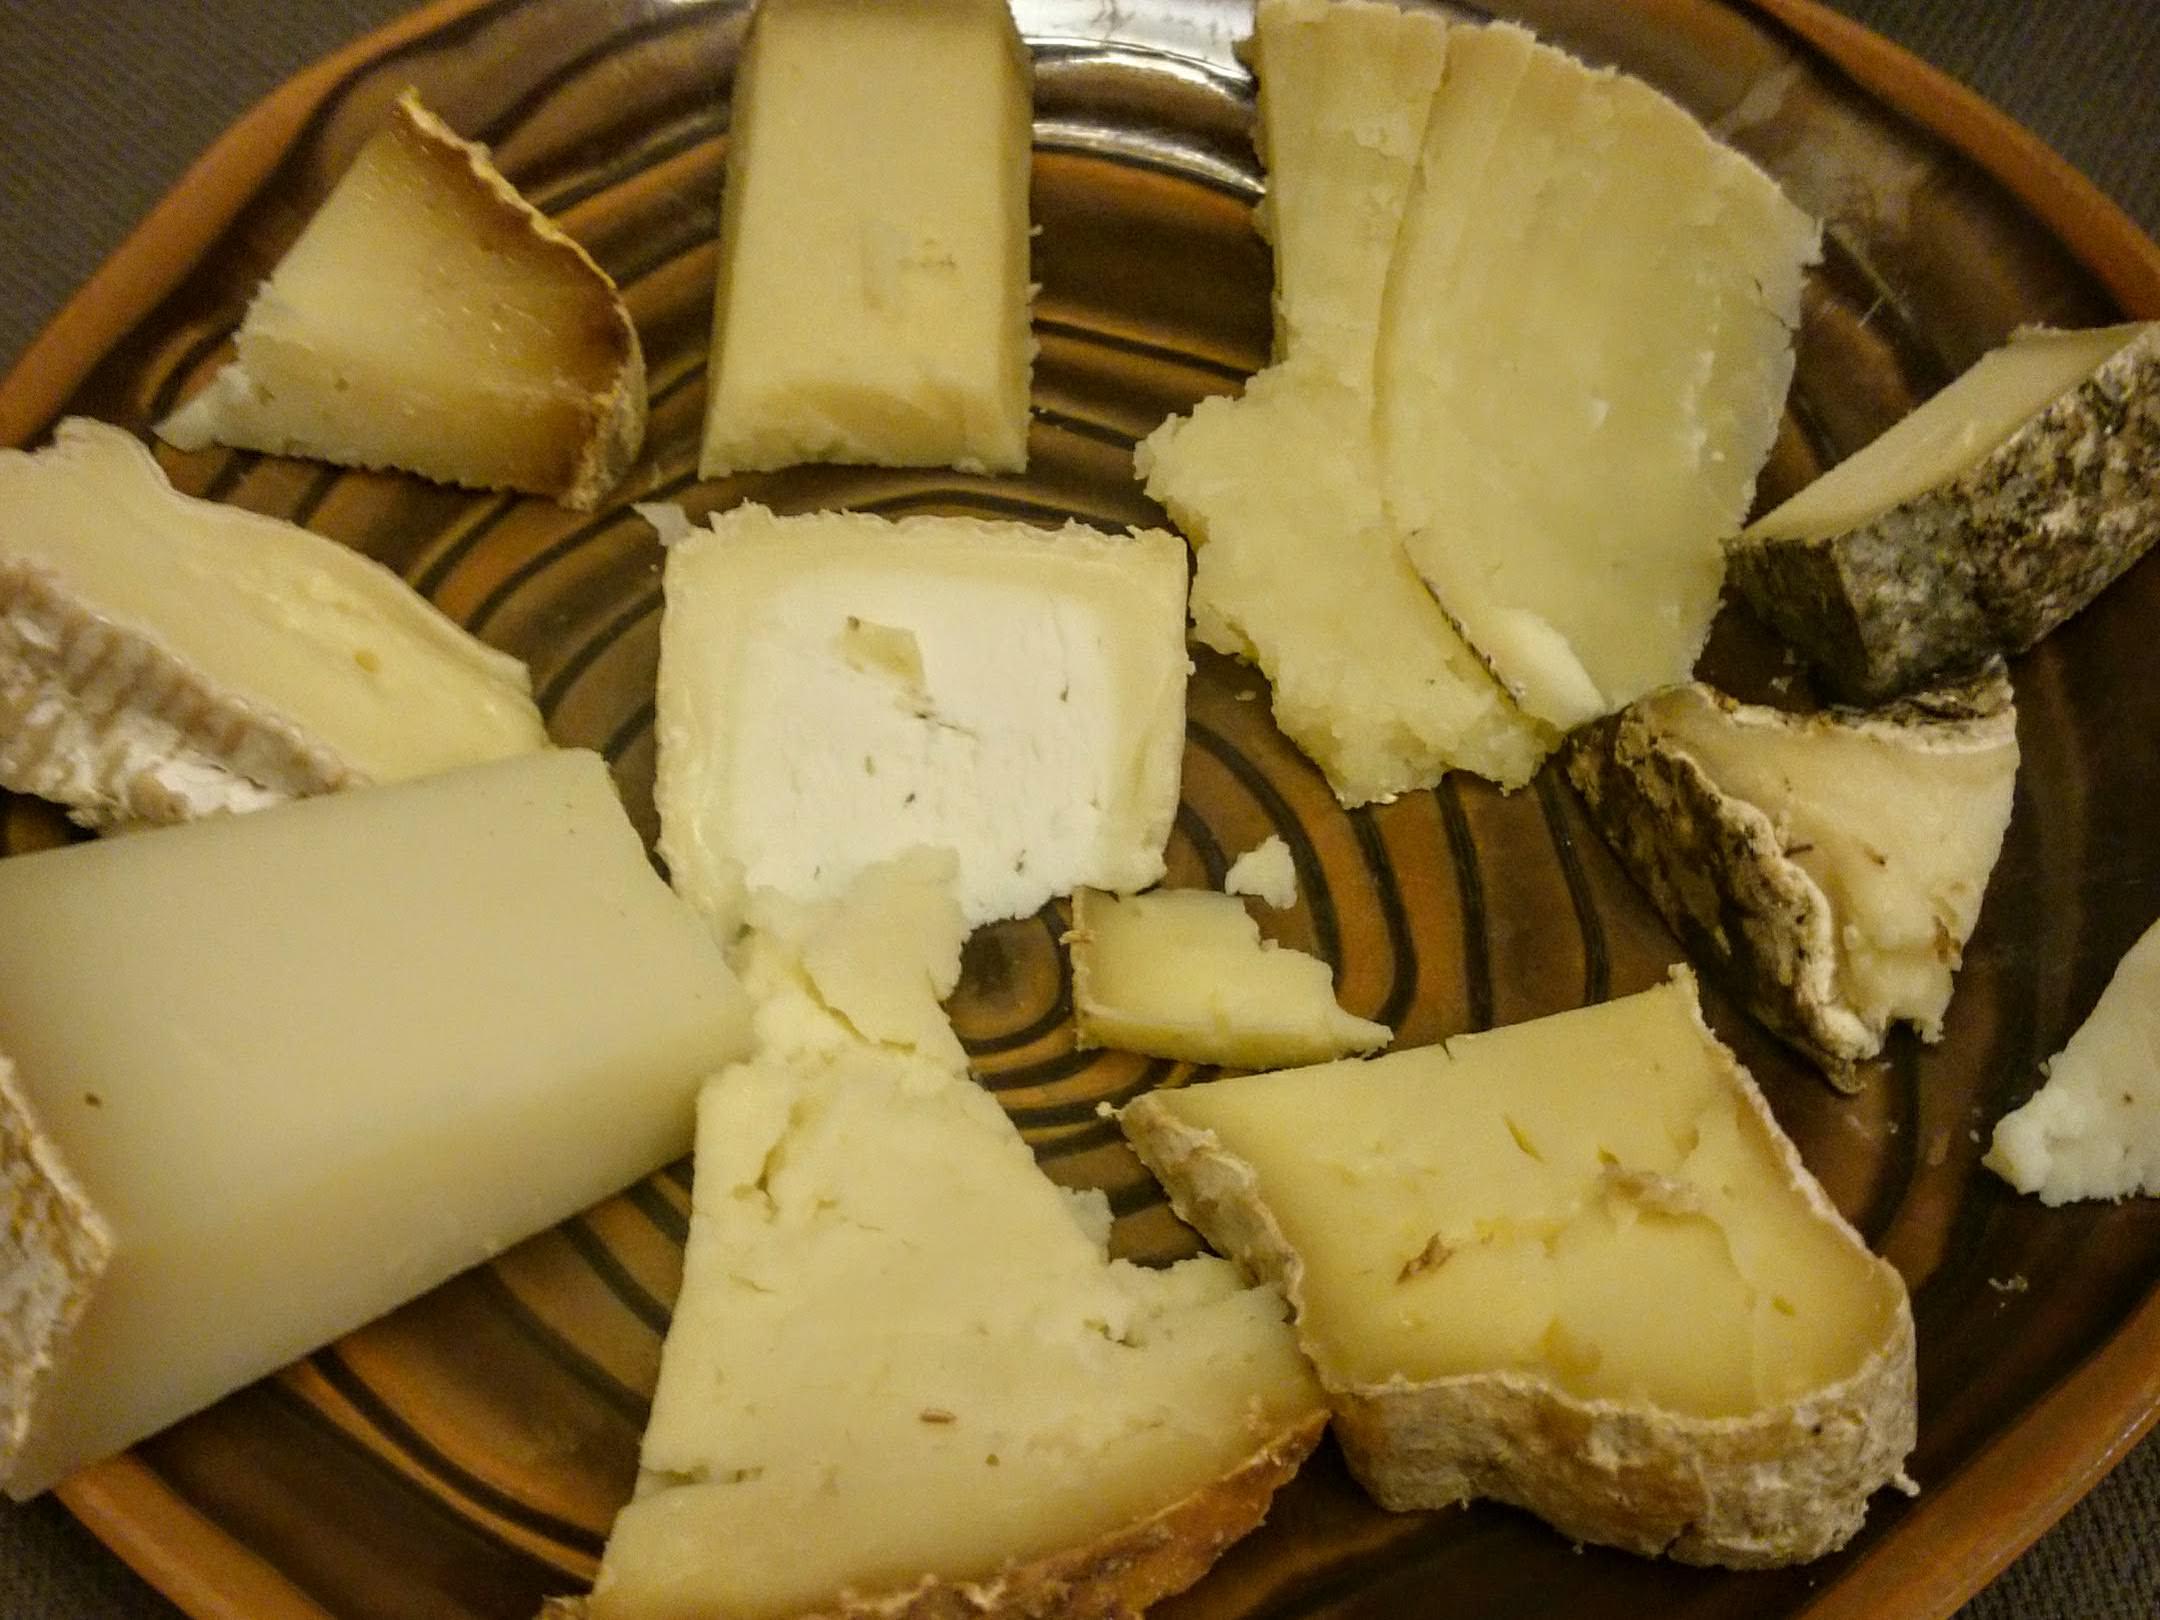 cheeseplate-chateau-de-champlong.